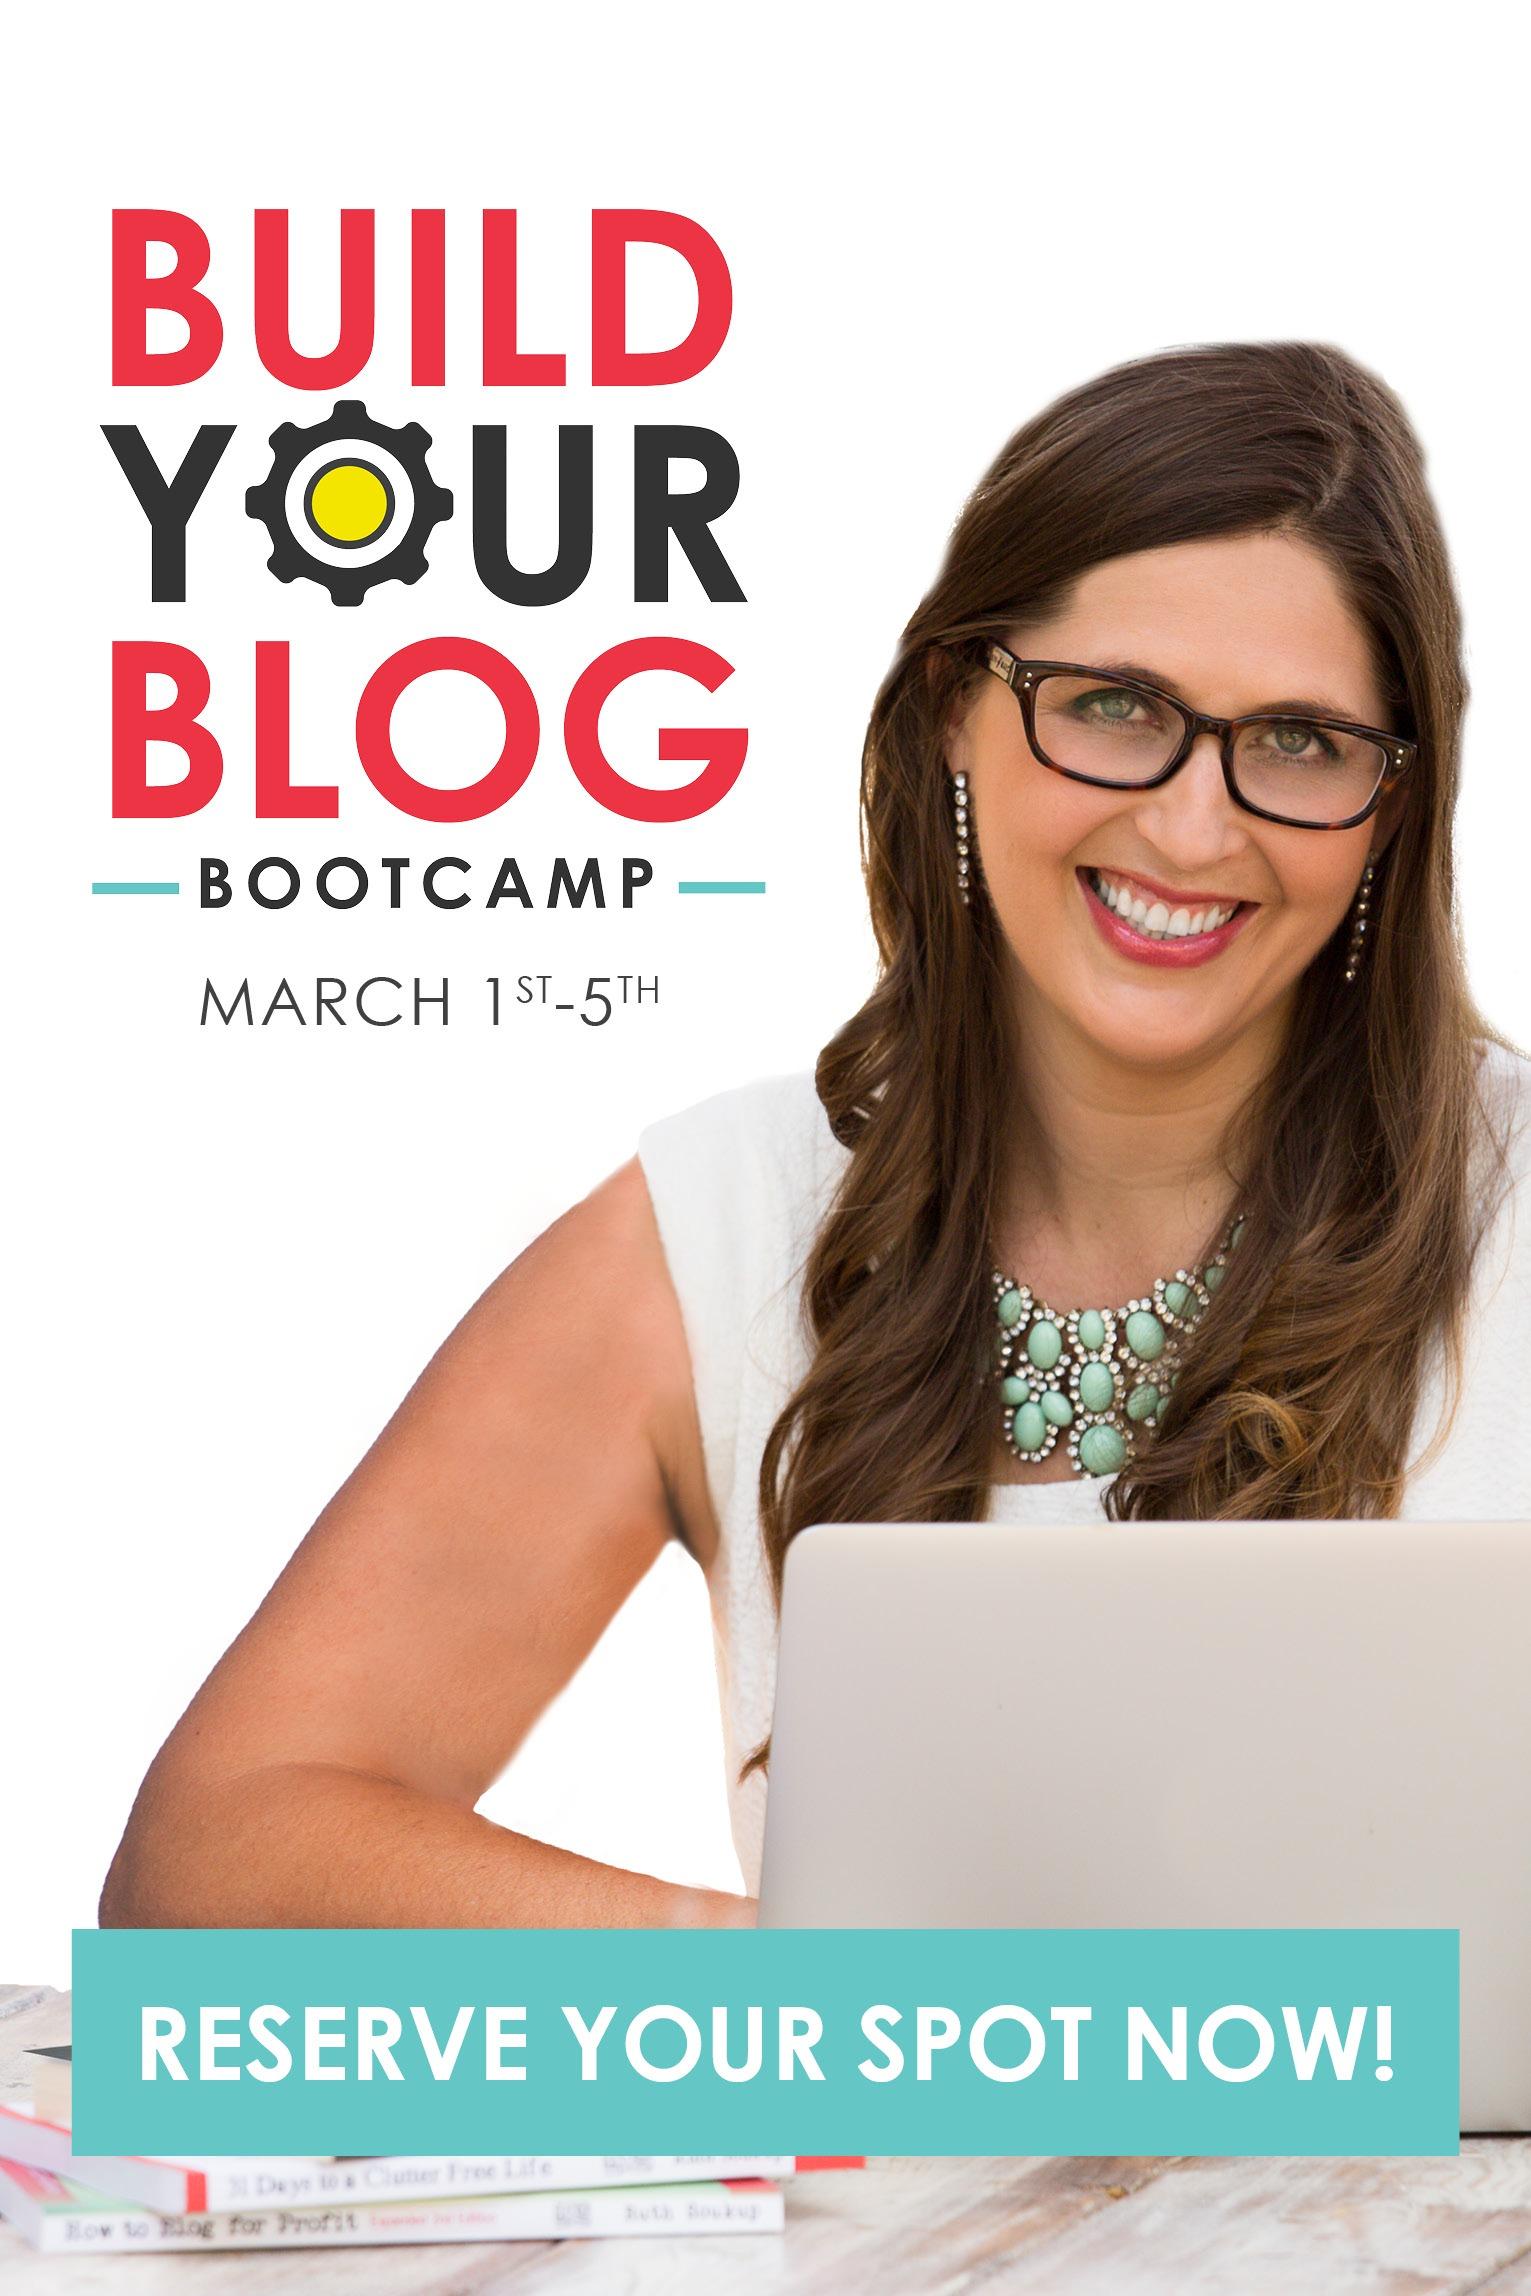 Build Your Blog Bootcamp-Pinterest